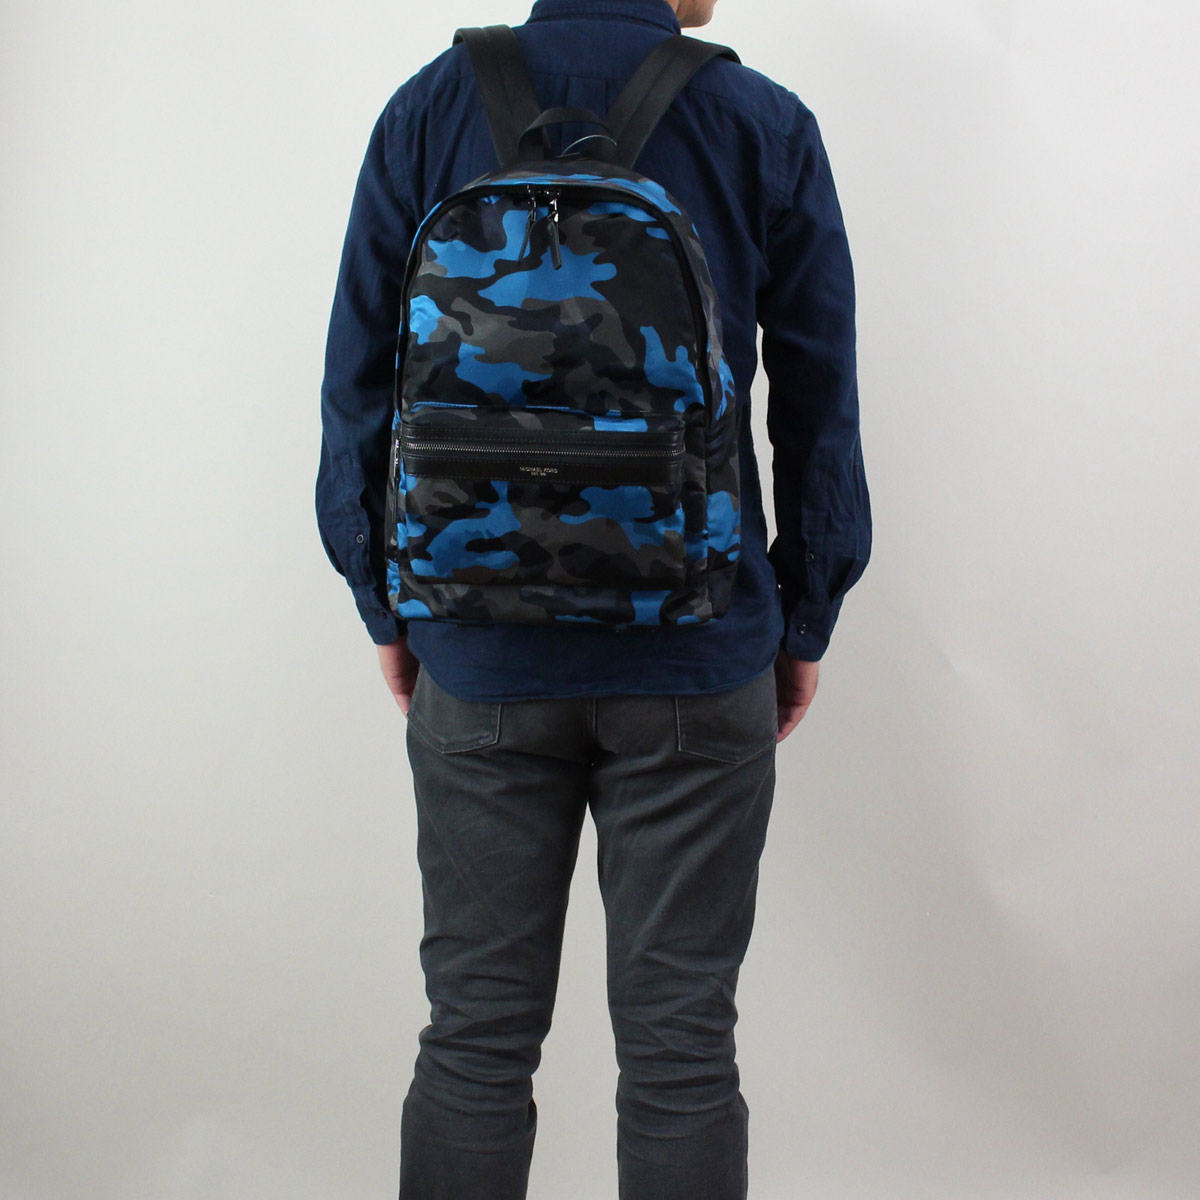 dea38df918726c Bighit The total brand wholesale: Michael Kors MICHAEL KORS rucksack ...